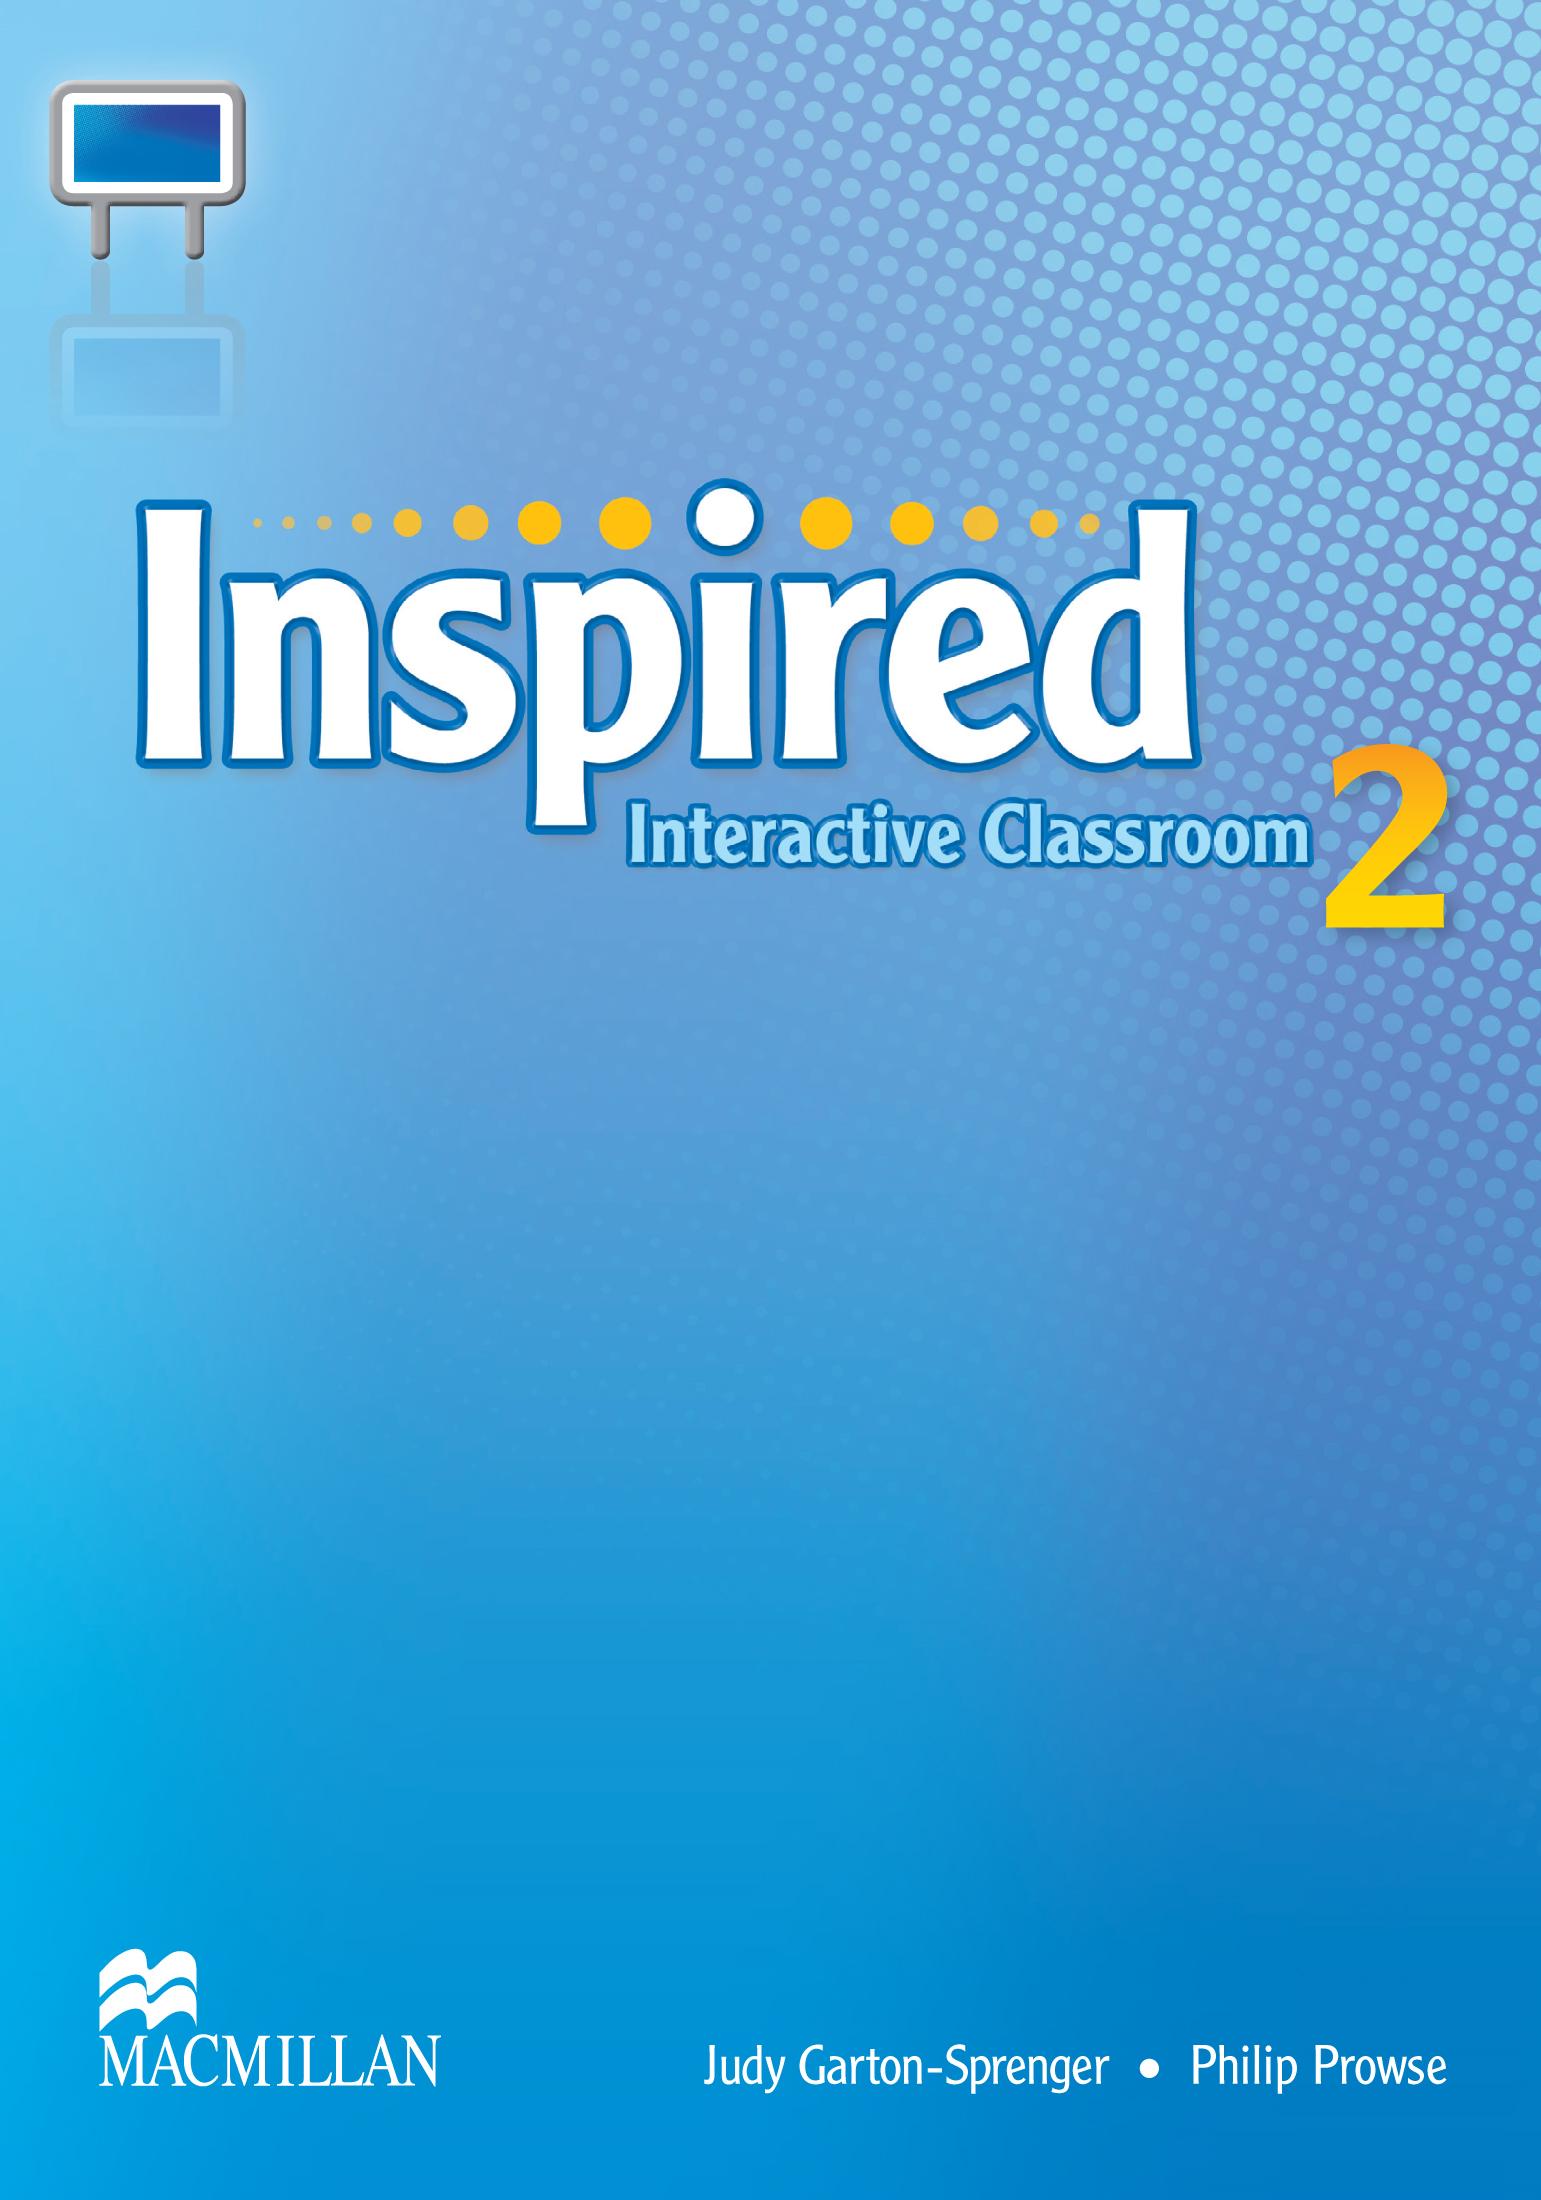 Inspired 2 Interactive Classroom